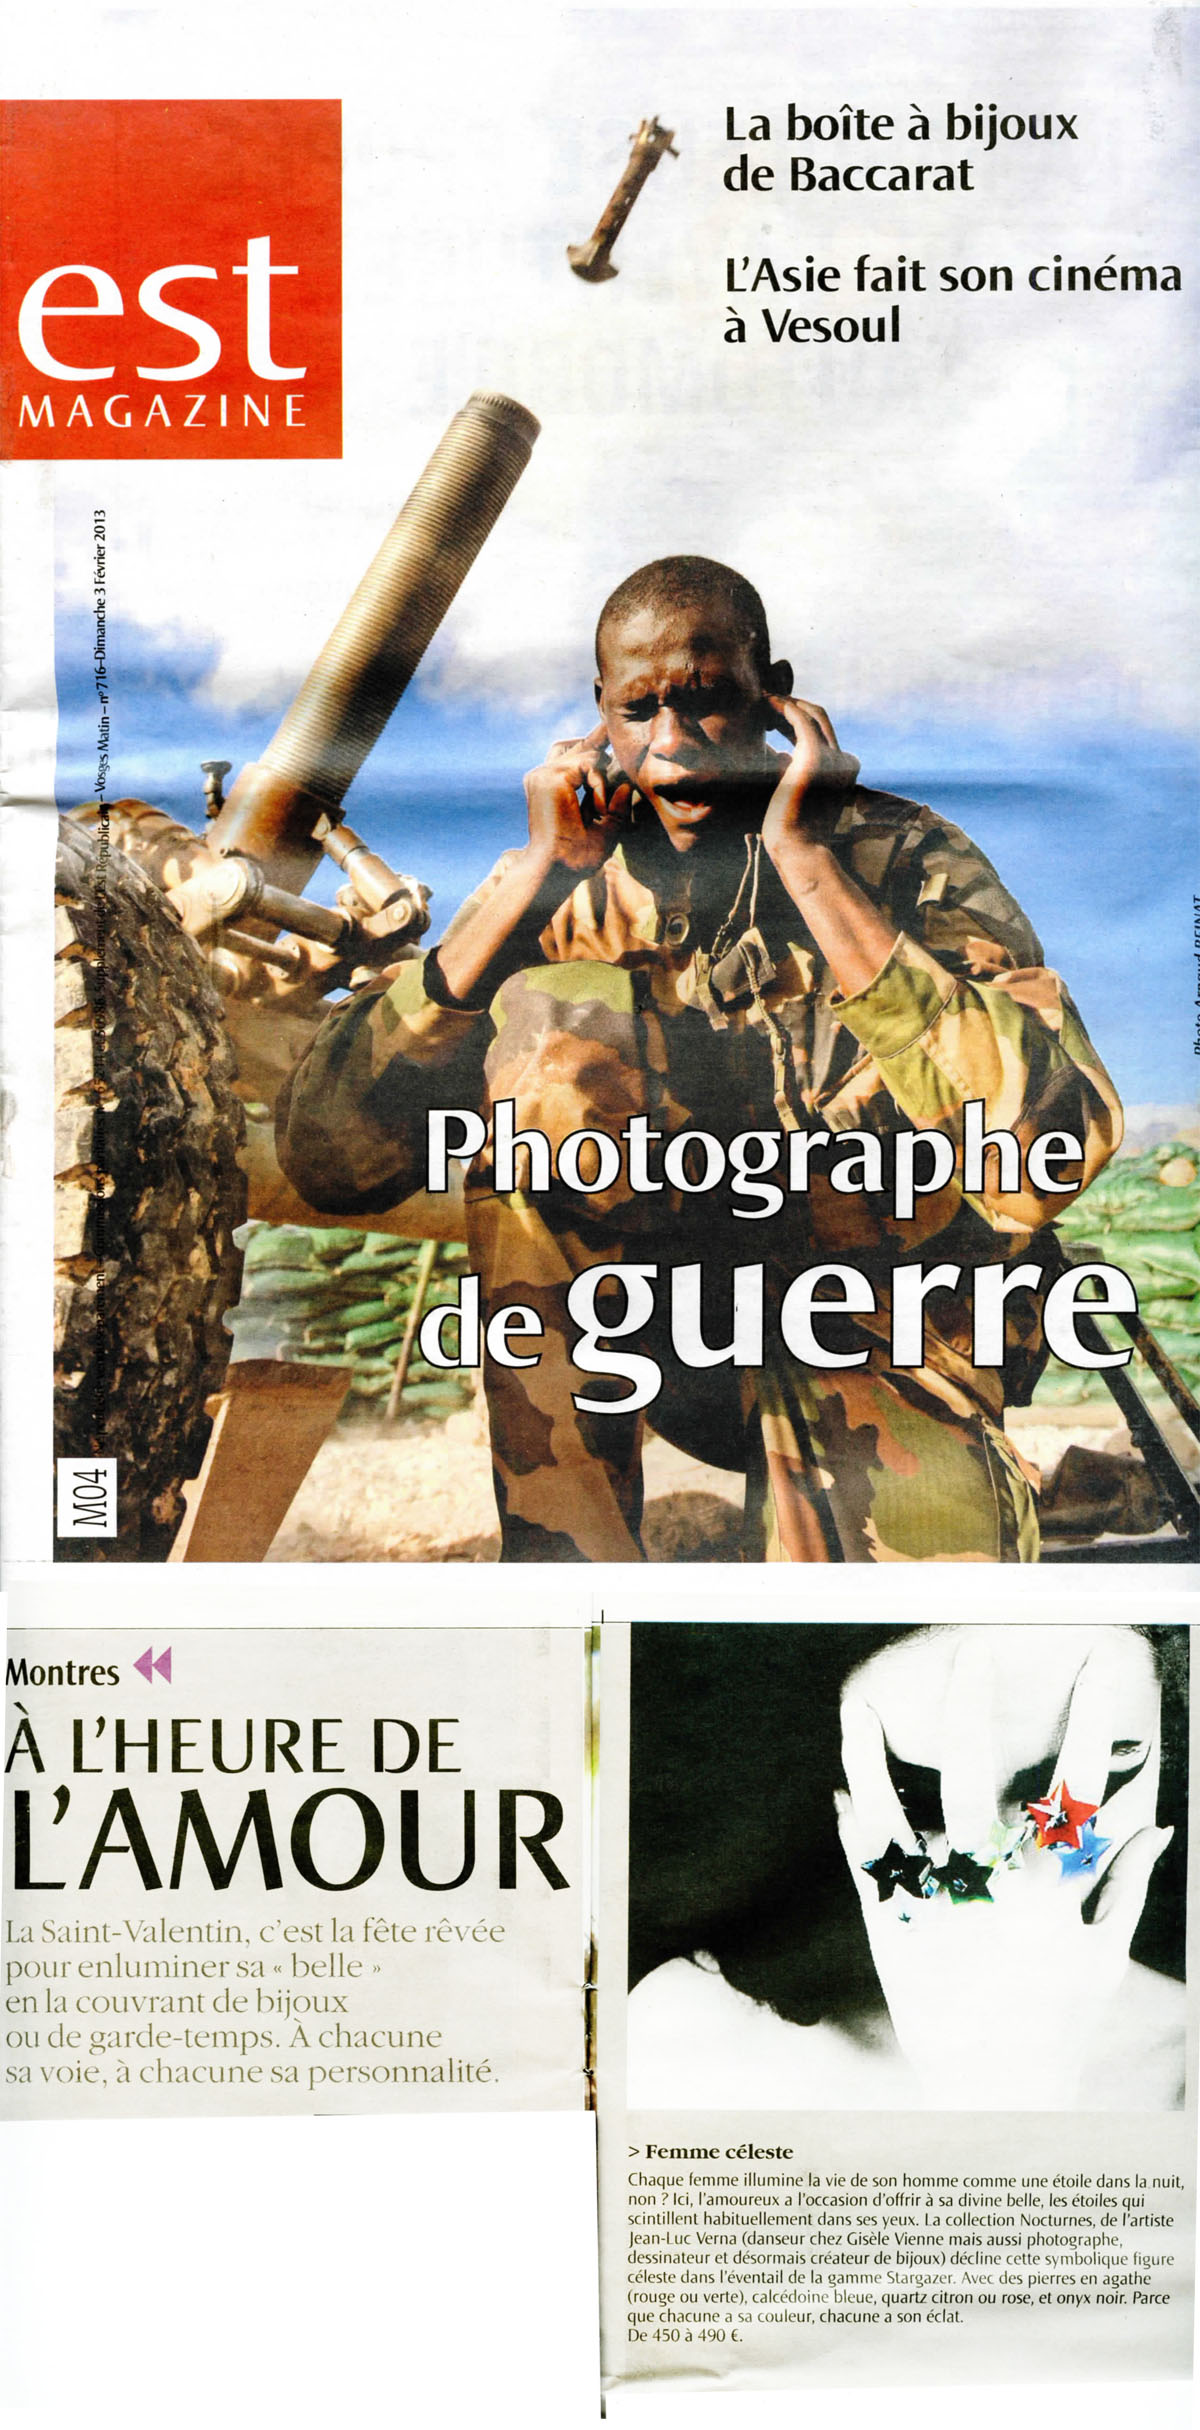 Est_magazine_3_02_2012-1.jpg